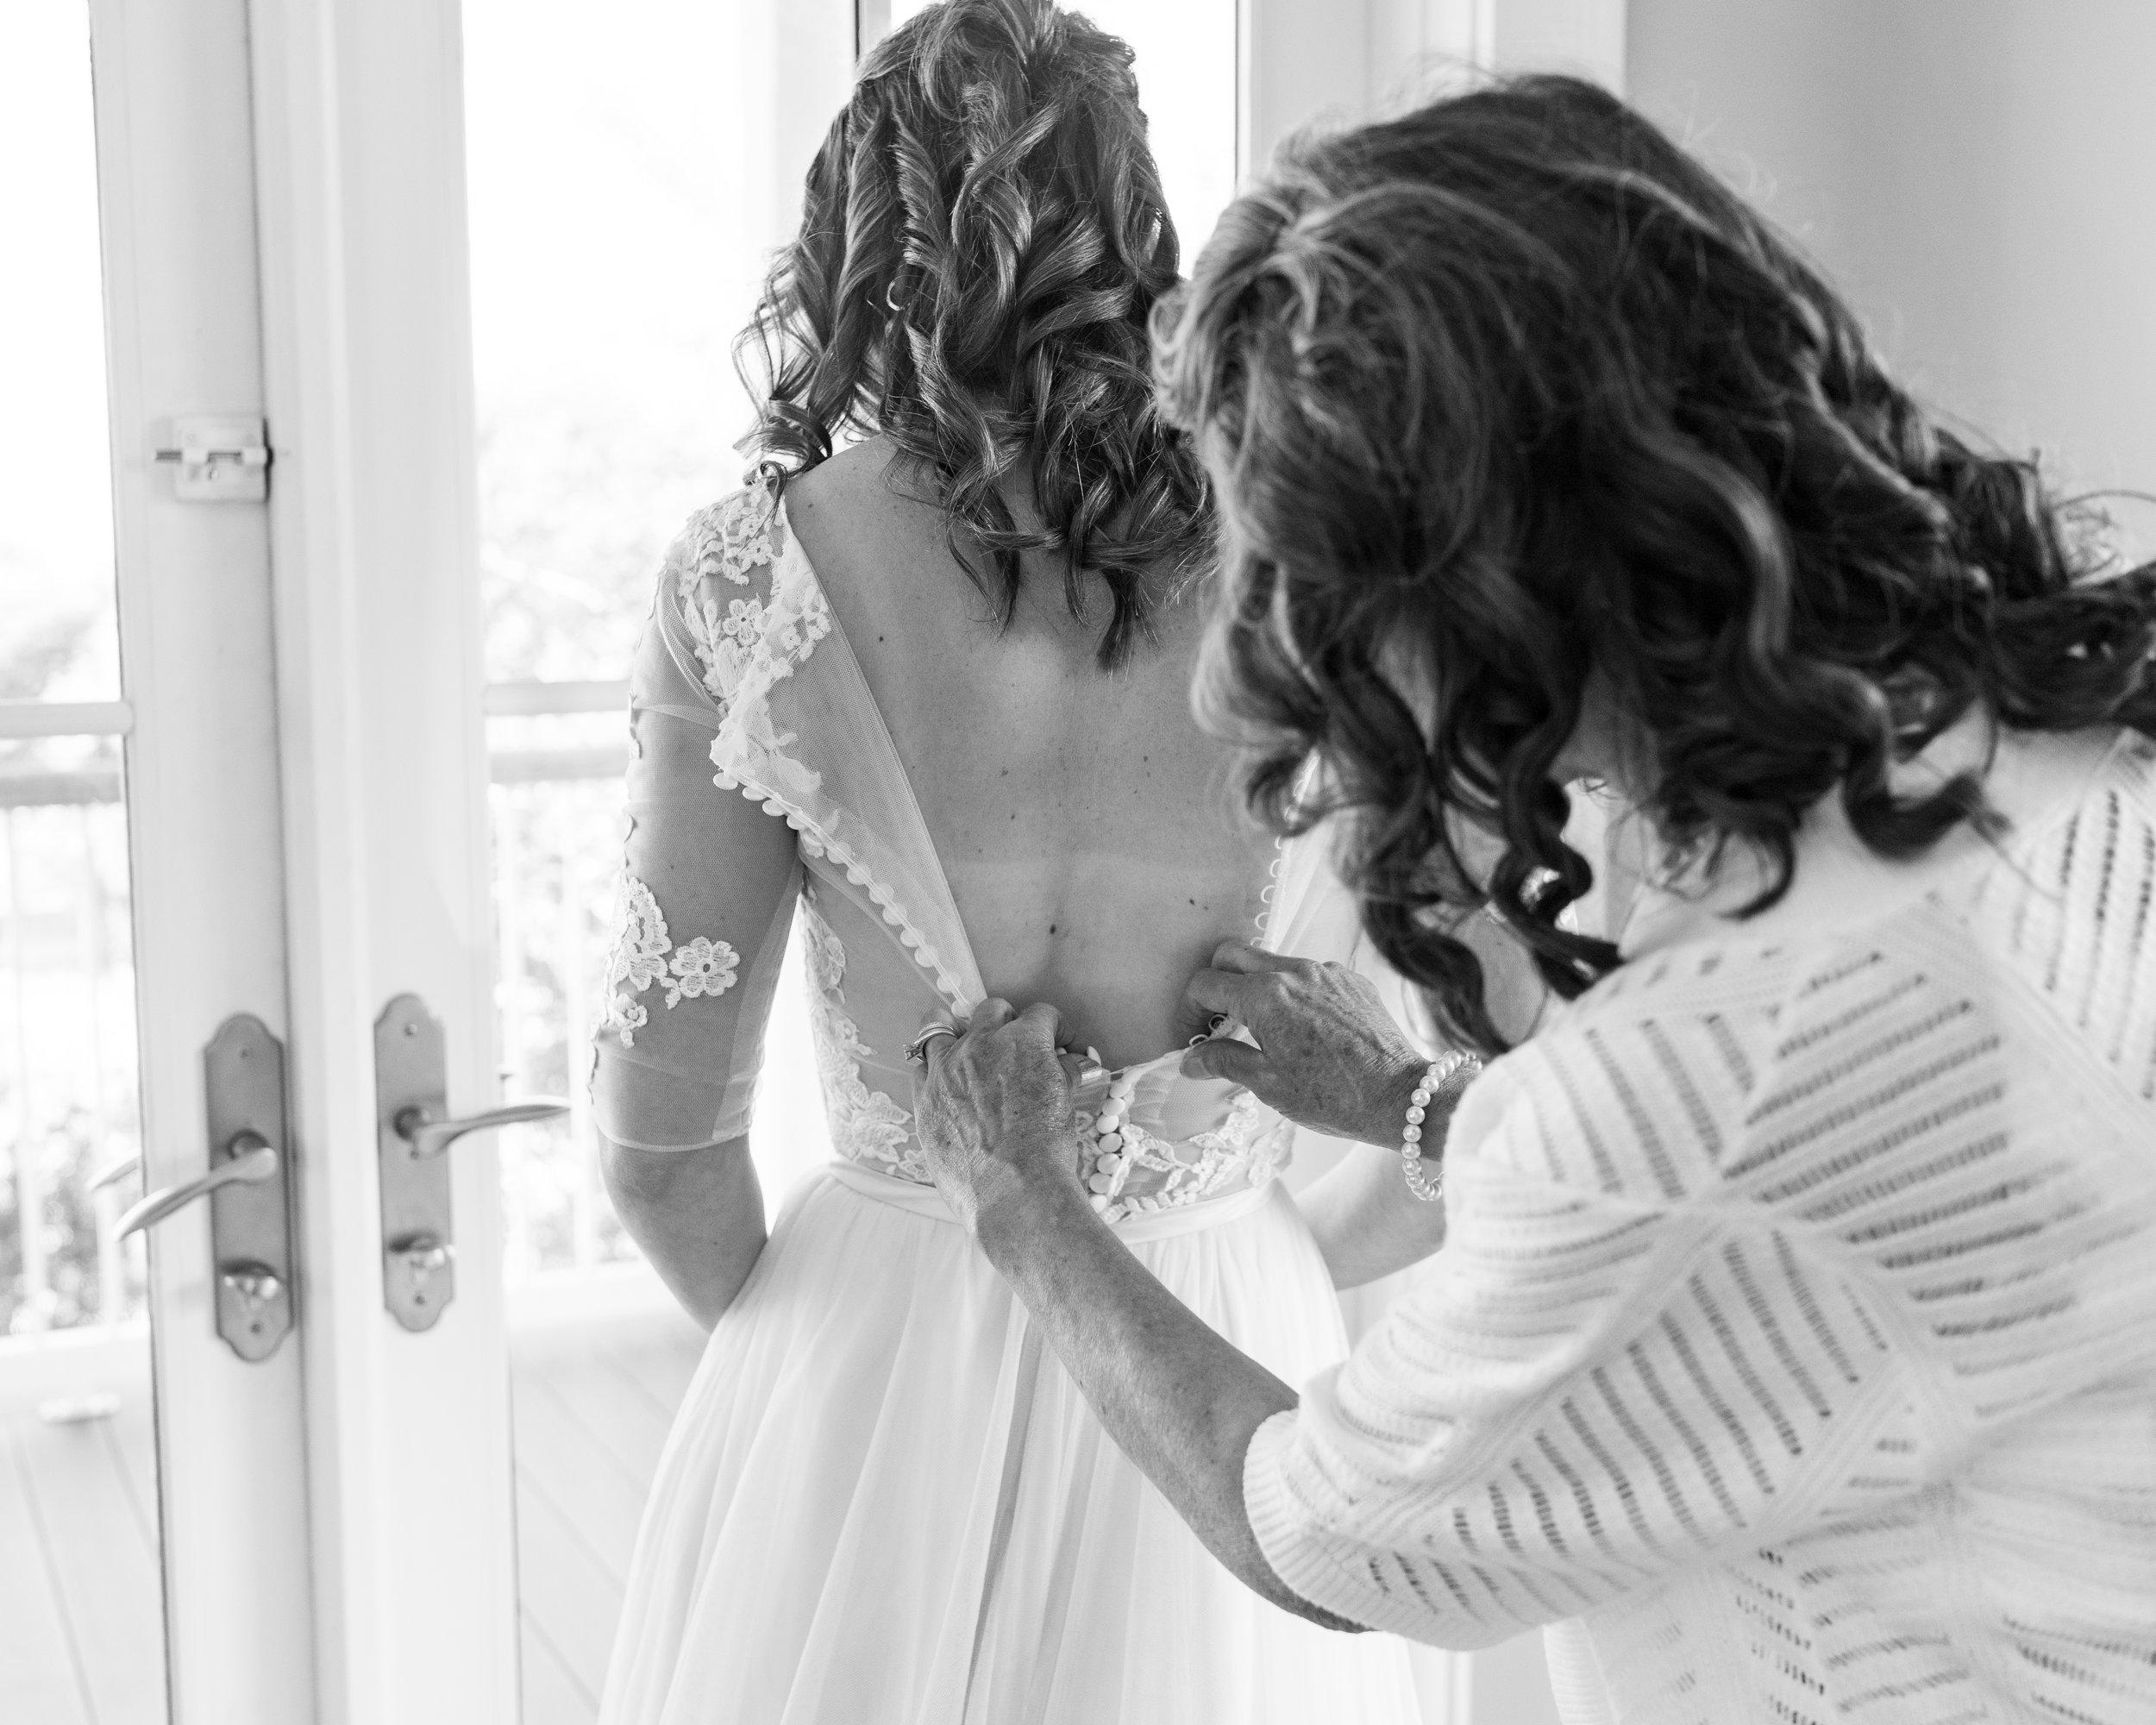 mother-of-bride-dress.jpg